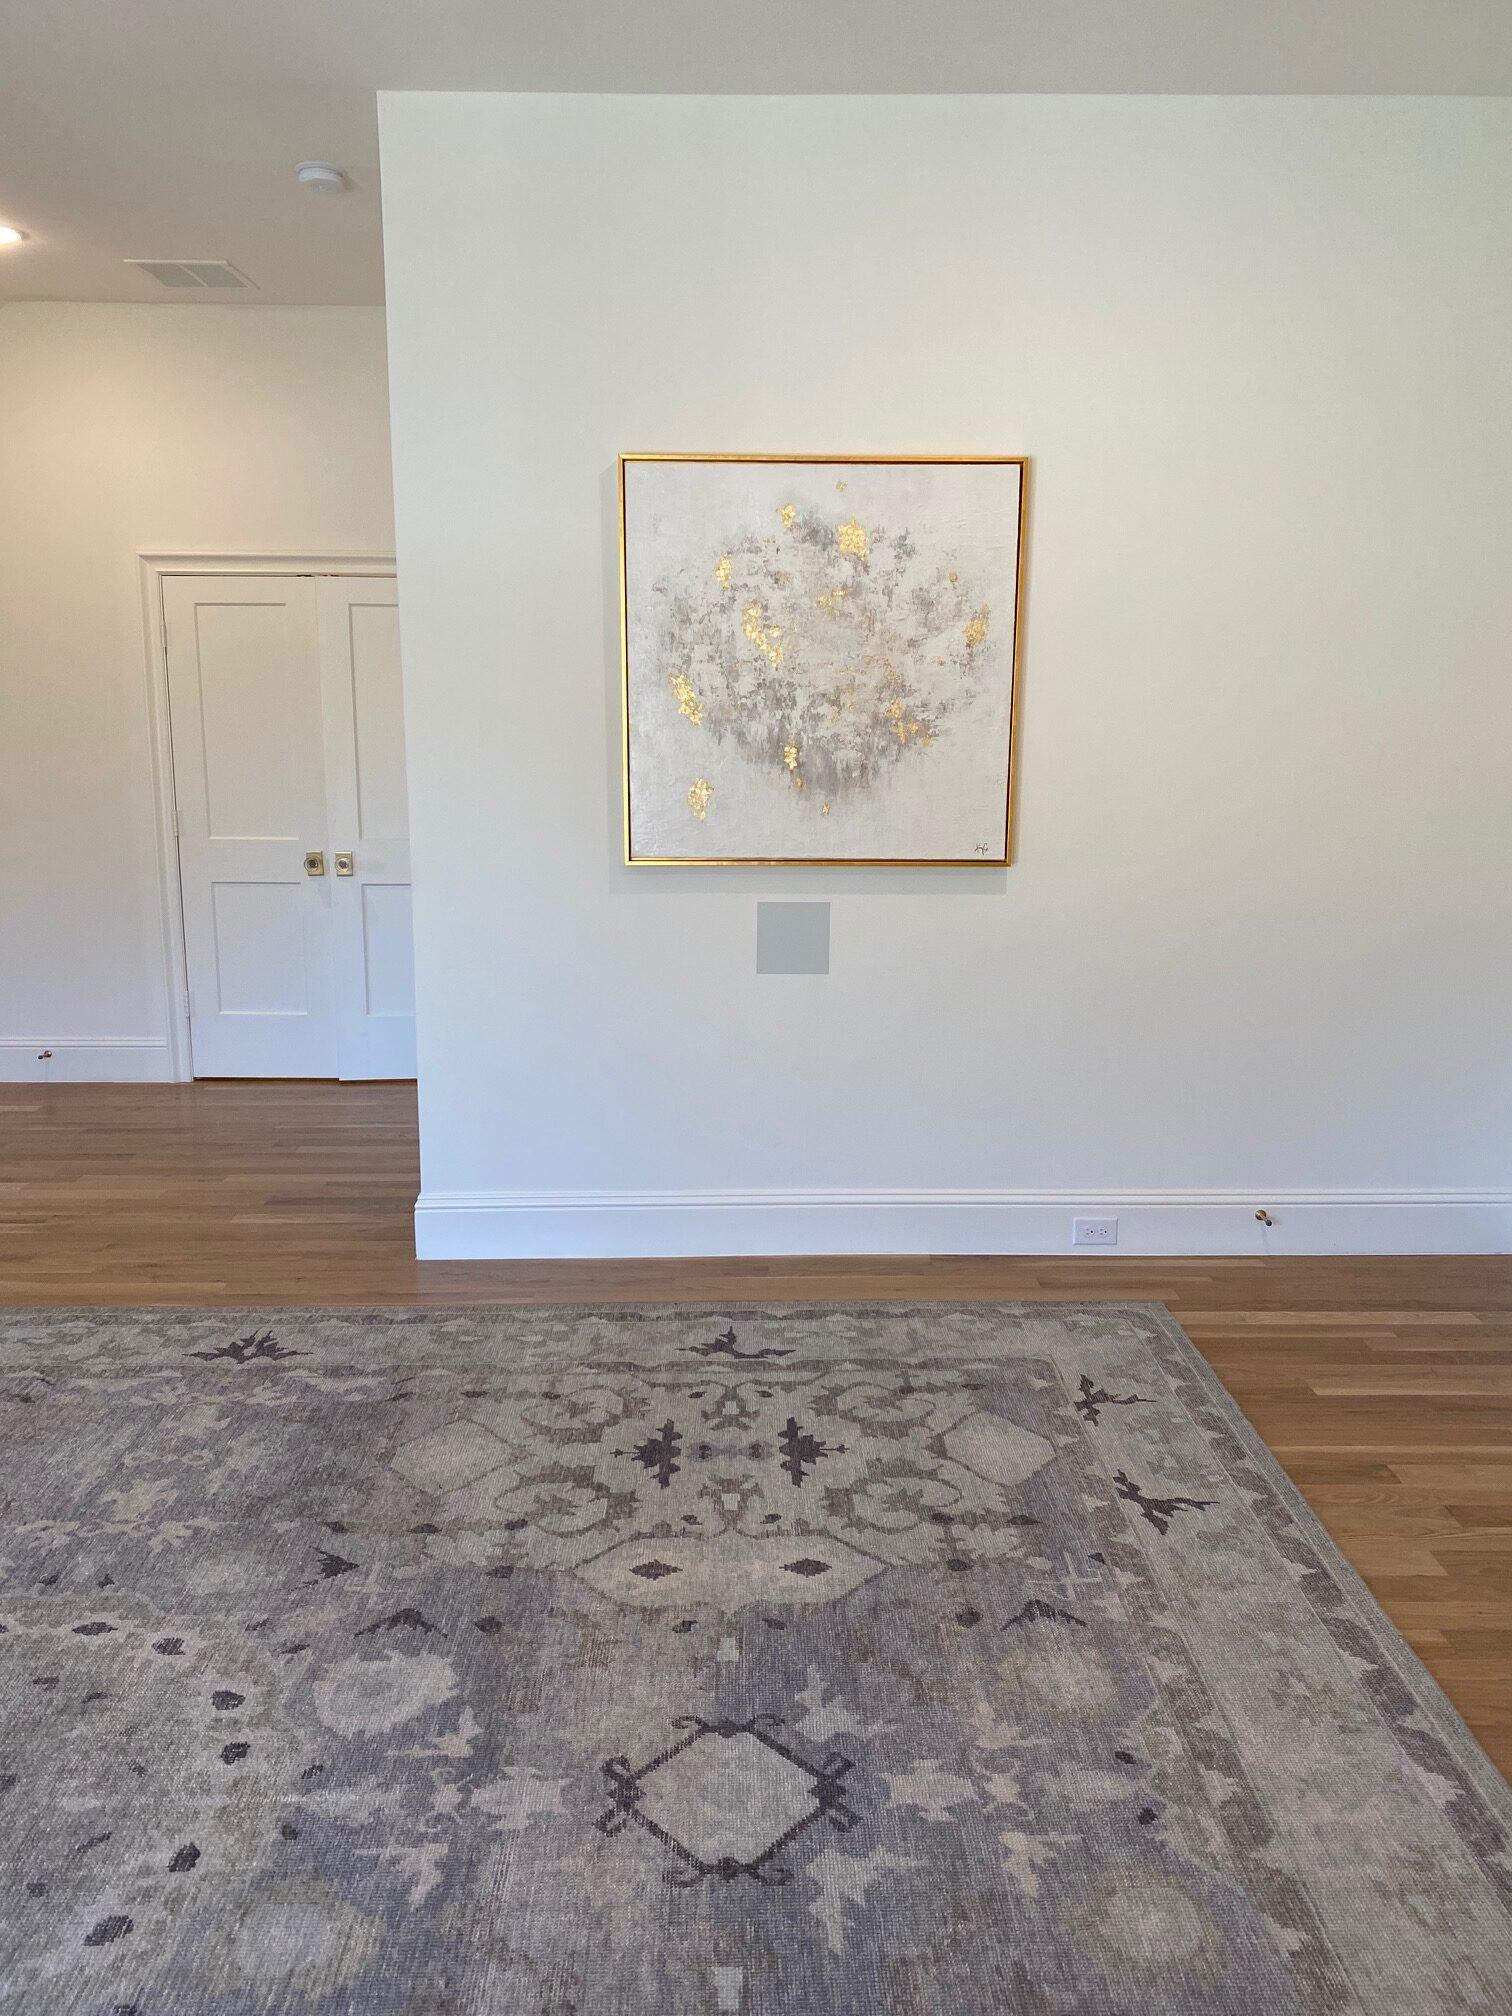 NEW HOUSE UPDATE: OFFICE REDESIGN SNEAK PEEK